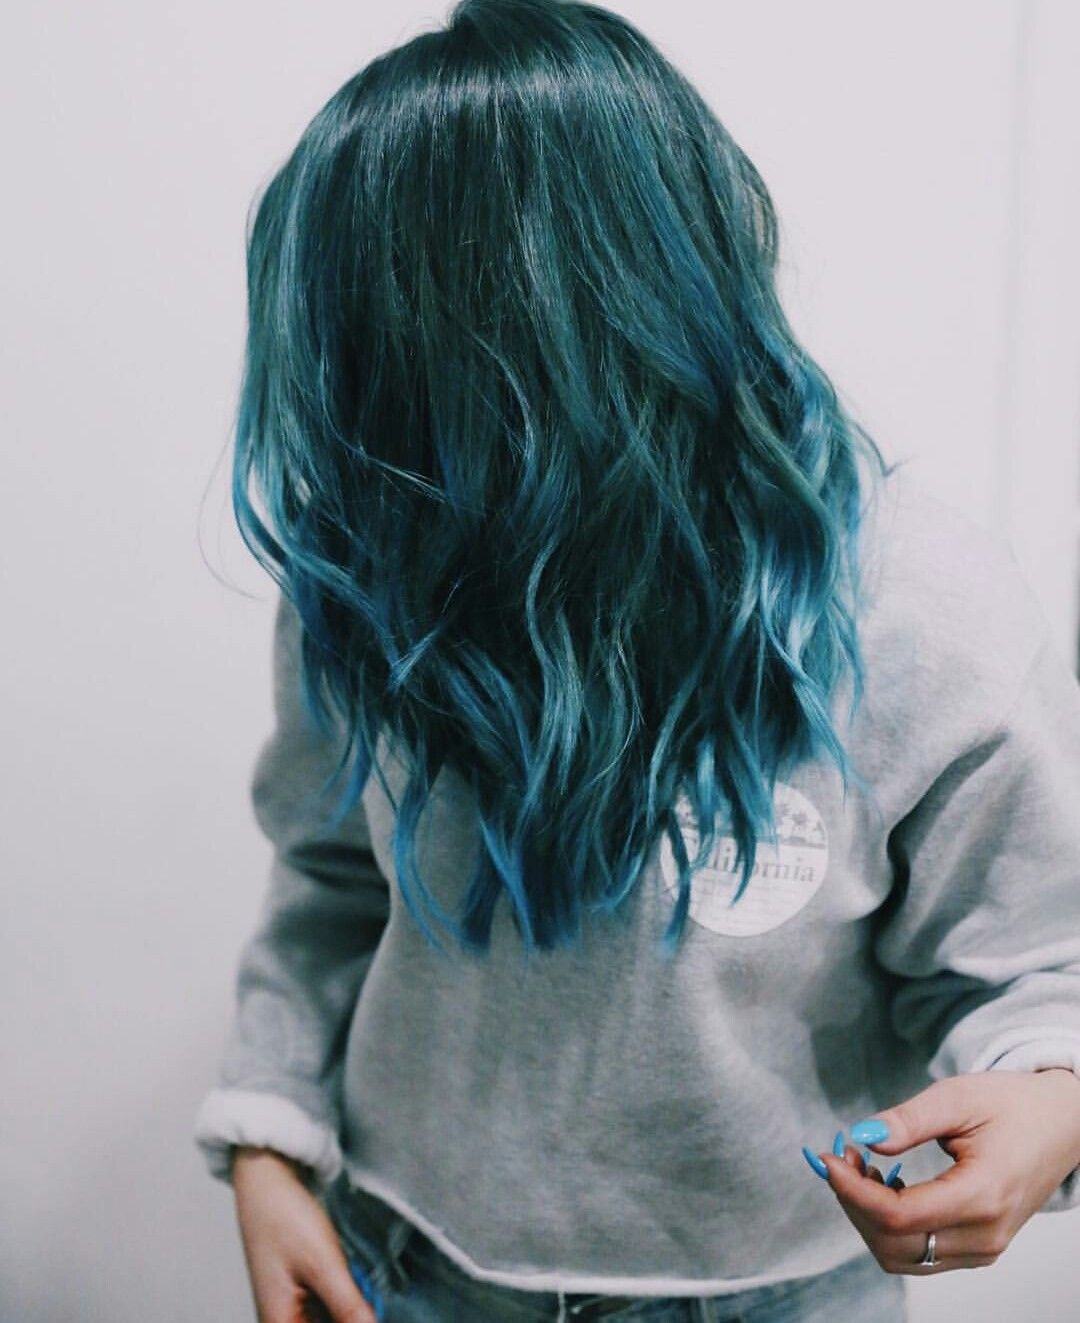 Love Niki S Hair Hair Dye Shades Teal Hair Dye Hair Styles